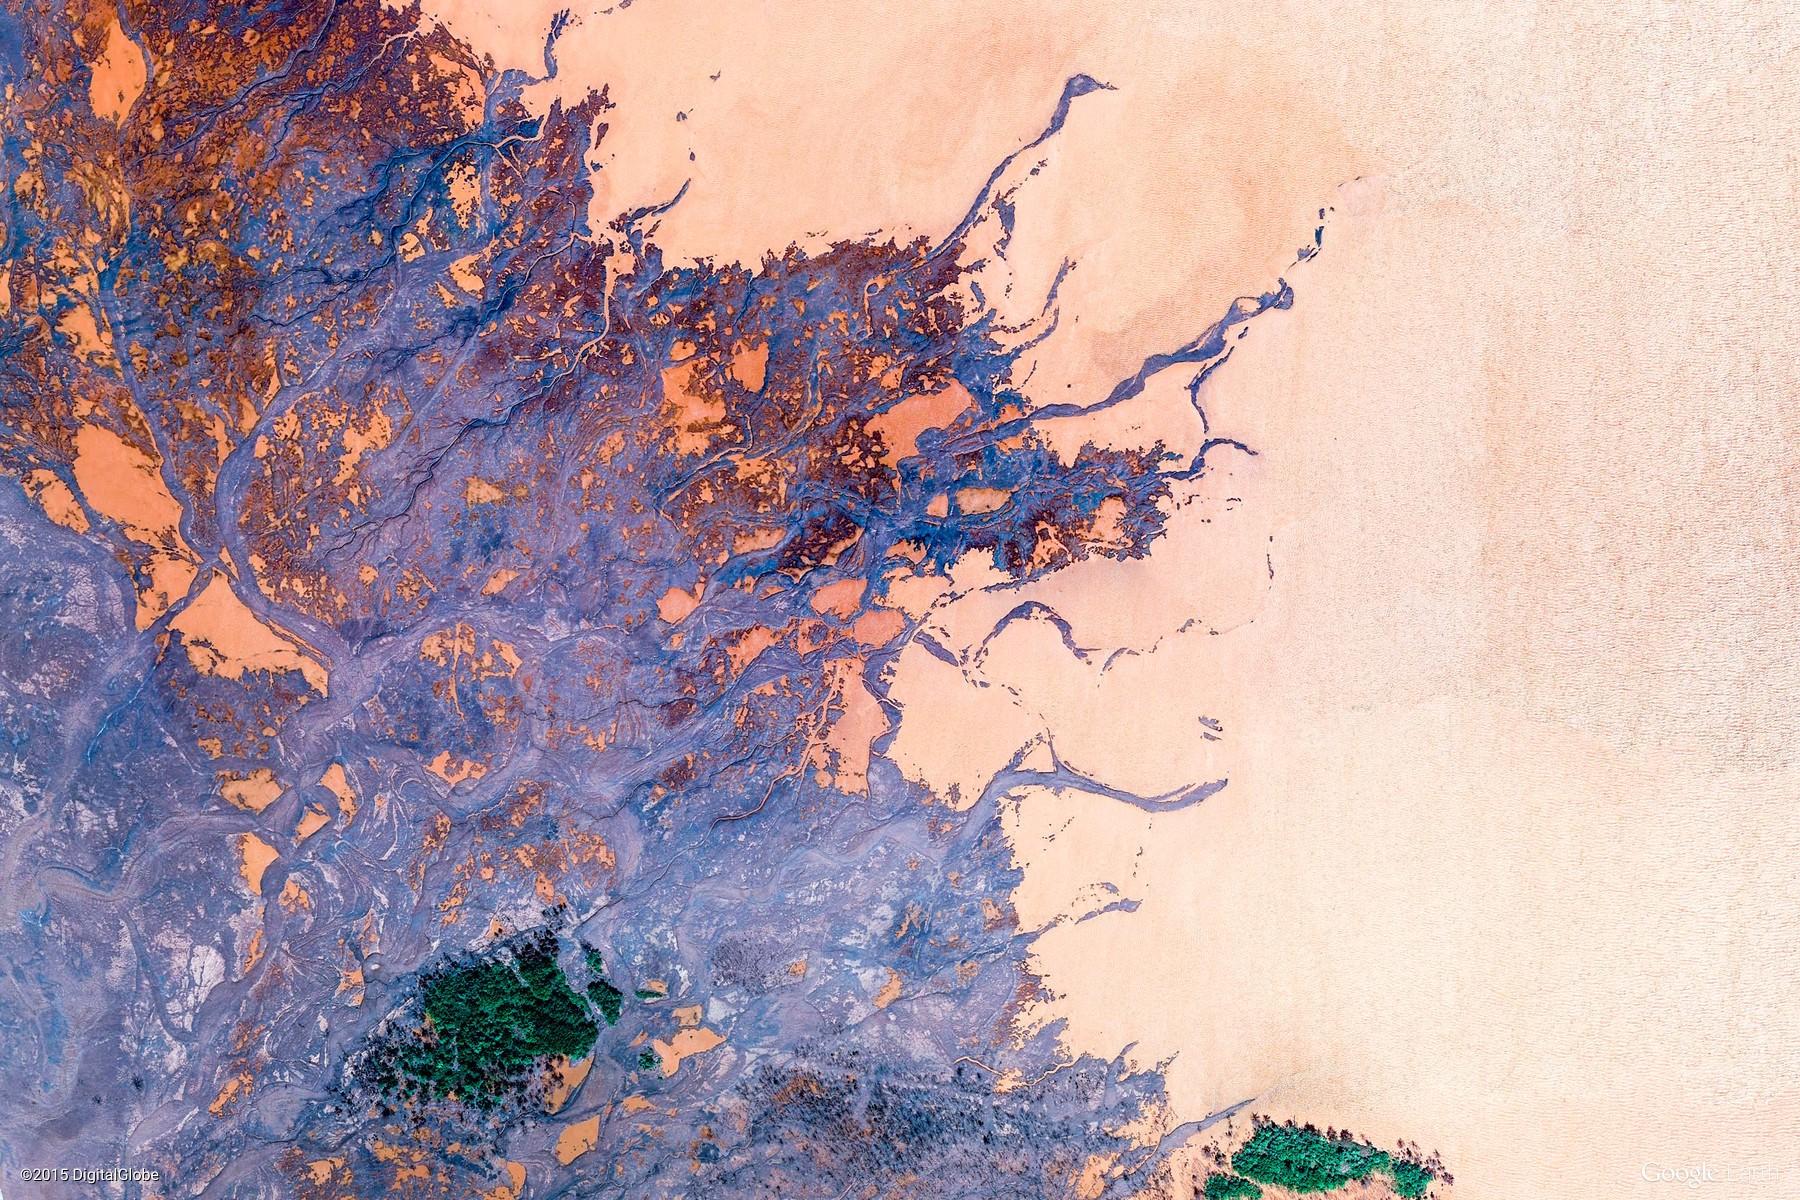 7Vgoogle-earth-view-5053.jpg